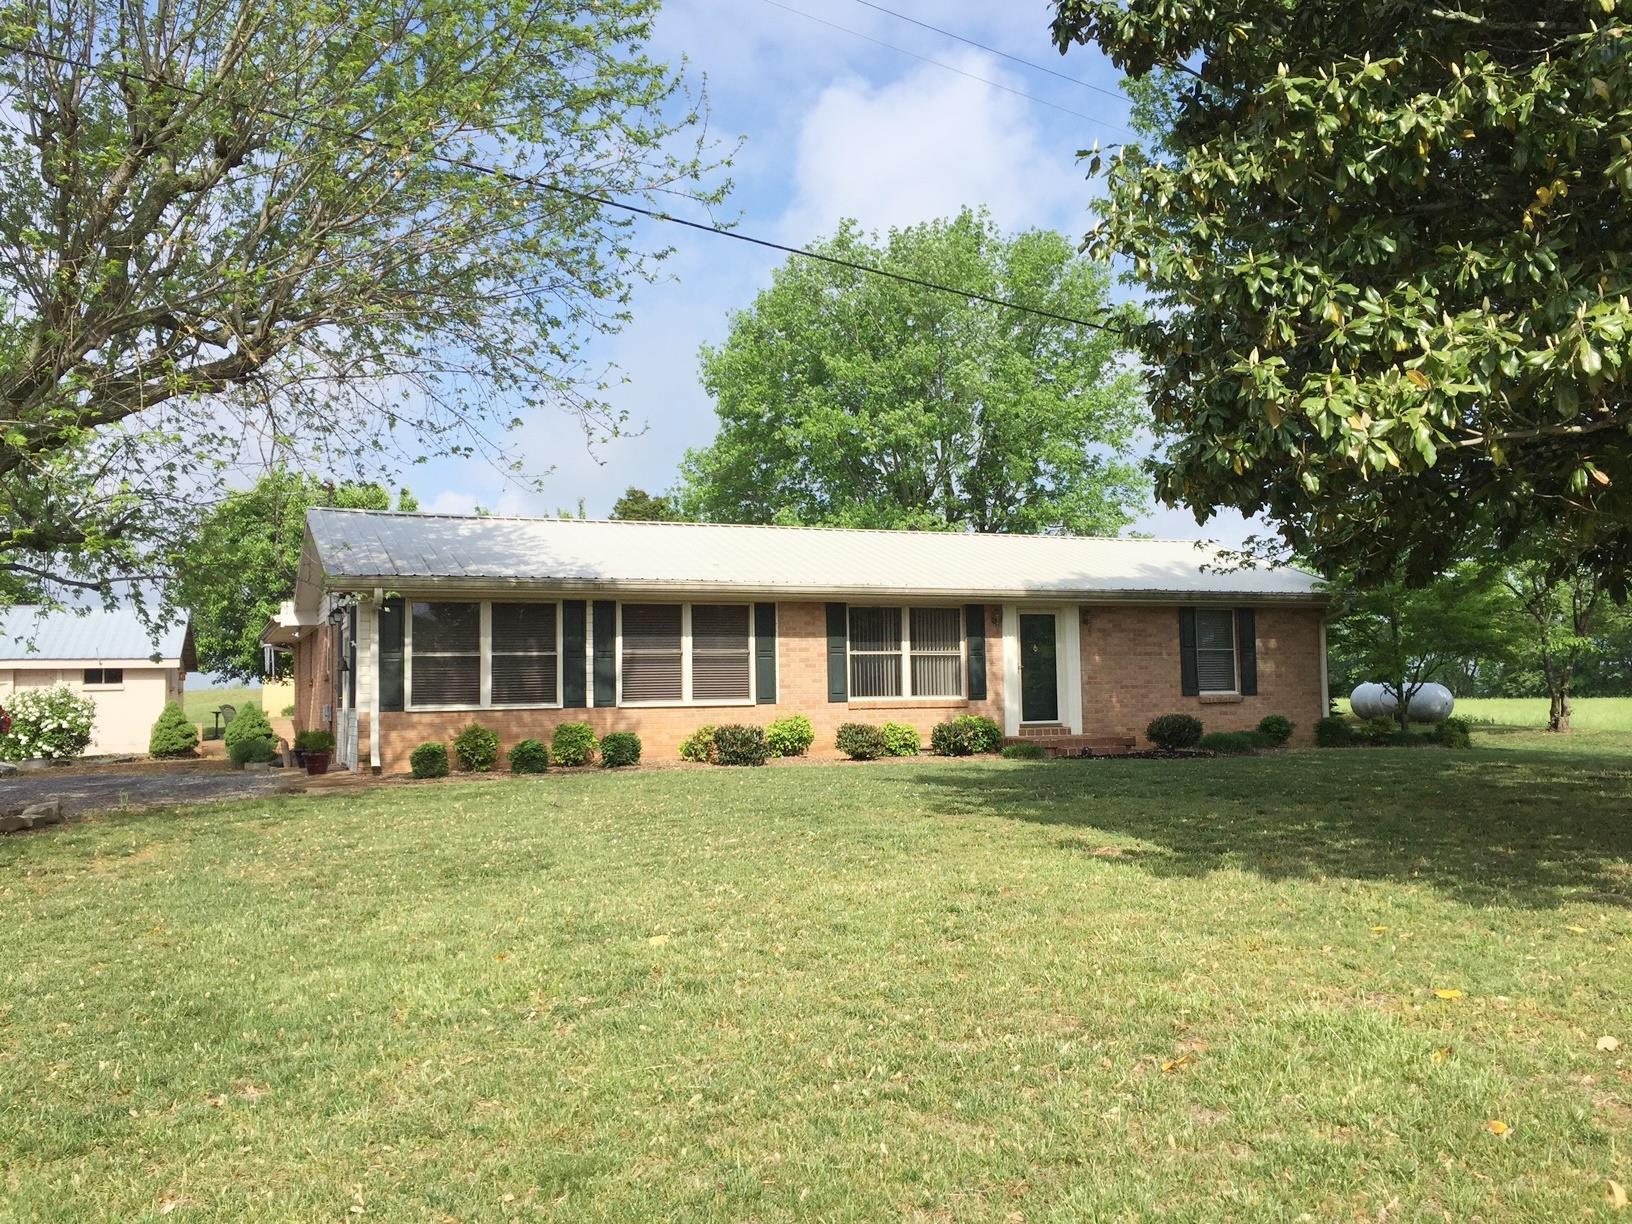 2546 Battle Creek Rd, Springfield, TN 37172